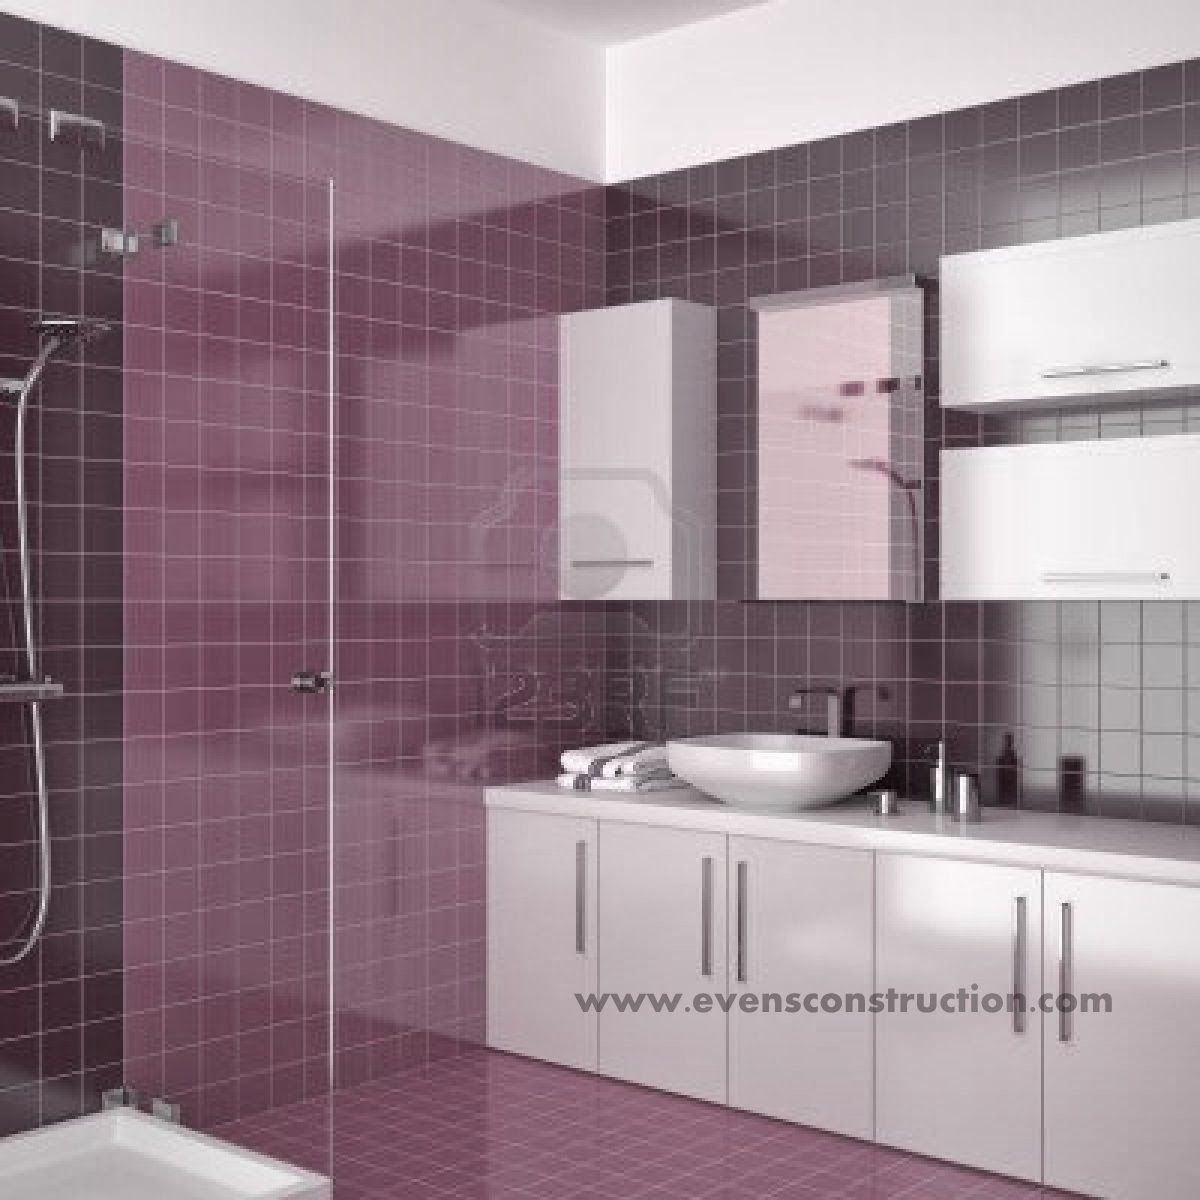 Evens construction pvt ltd bathroom tiles gallery for Carrelage salle de bain tendance 2016